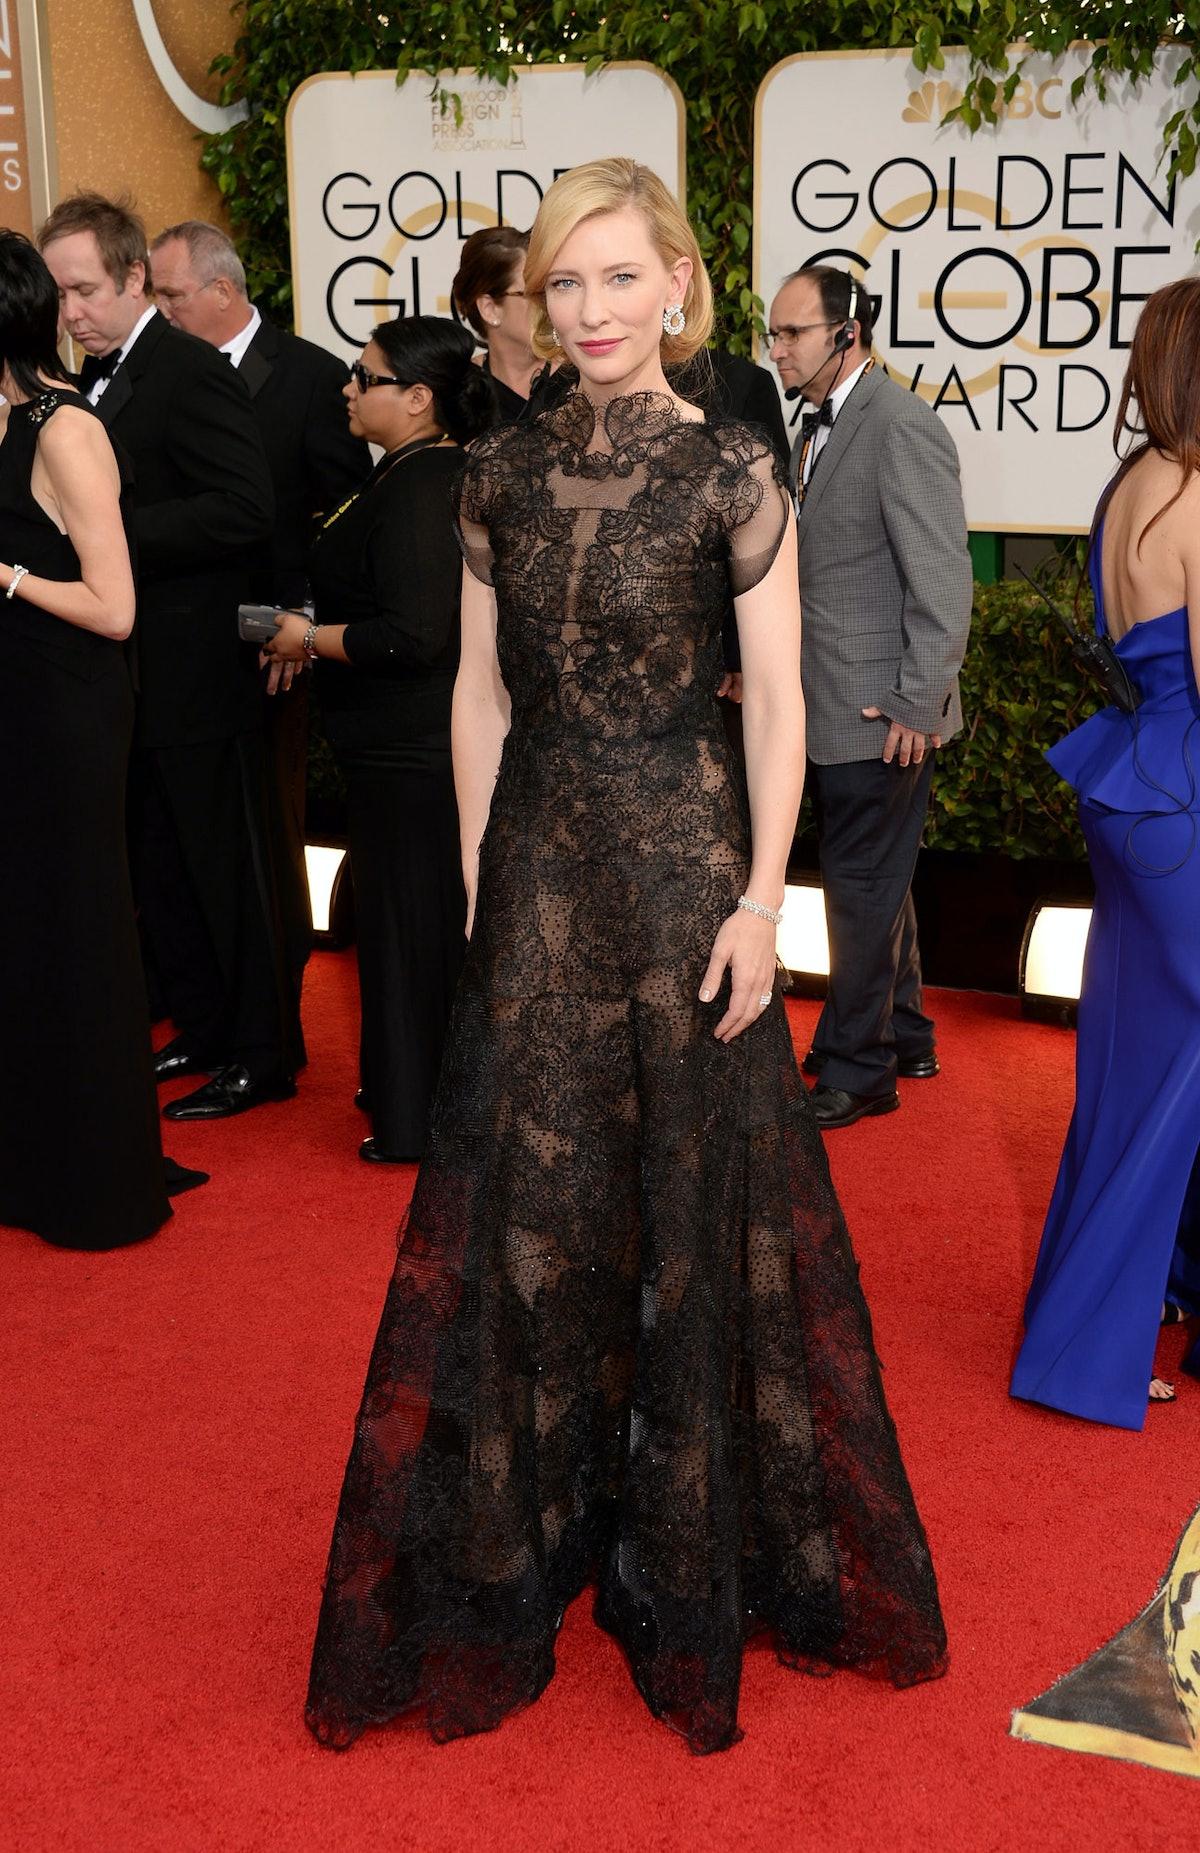 [Cate Blanchett](http://www.wmagazine.com/mood-board/filter?q=%5ECelebrity%7CCate%20Blanchett%7C) is...